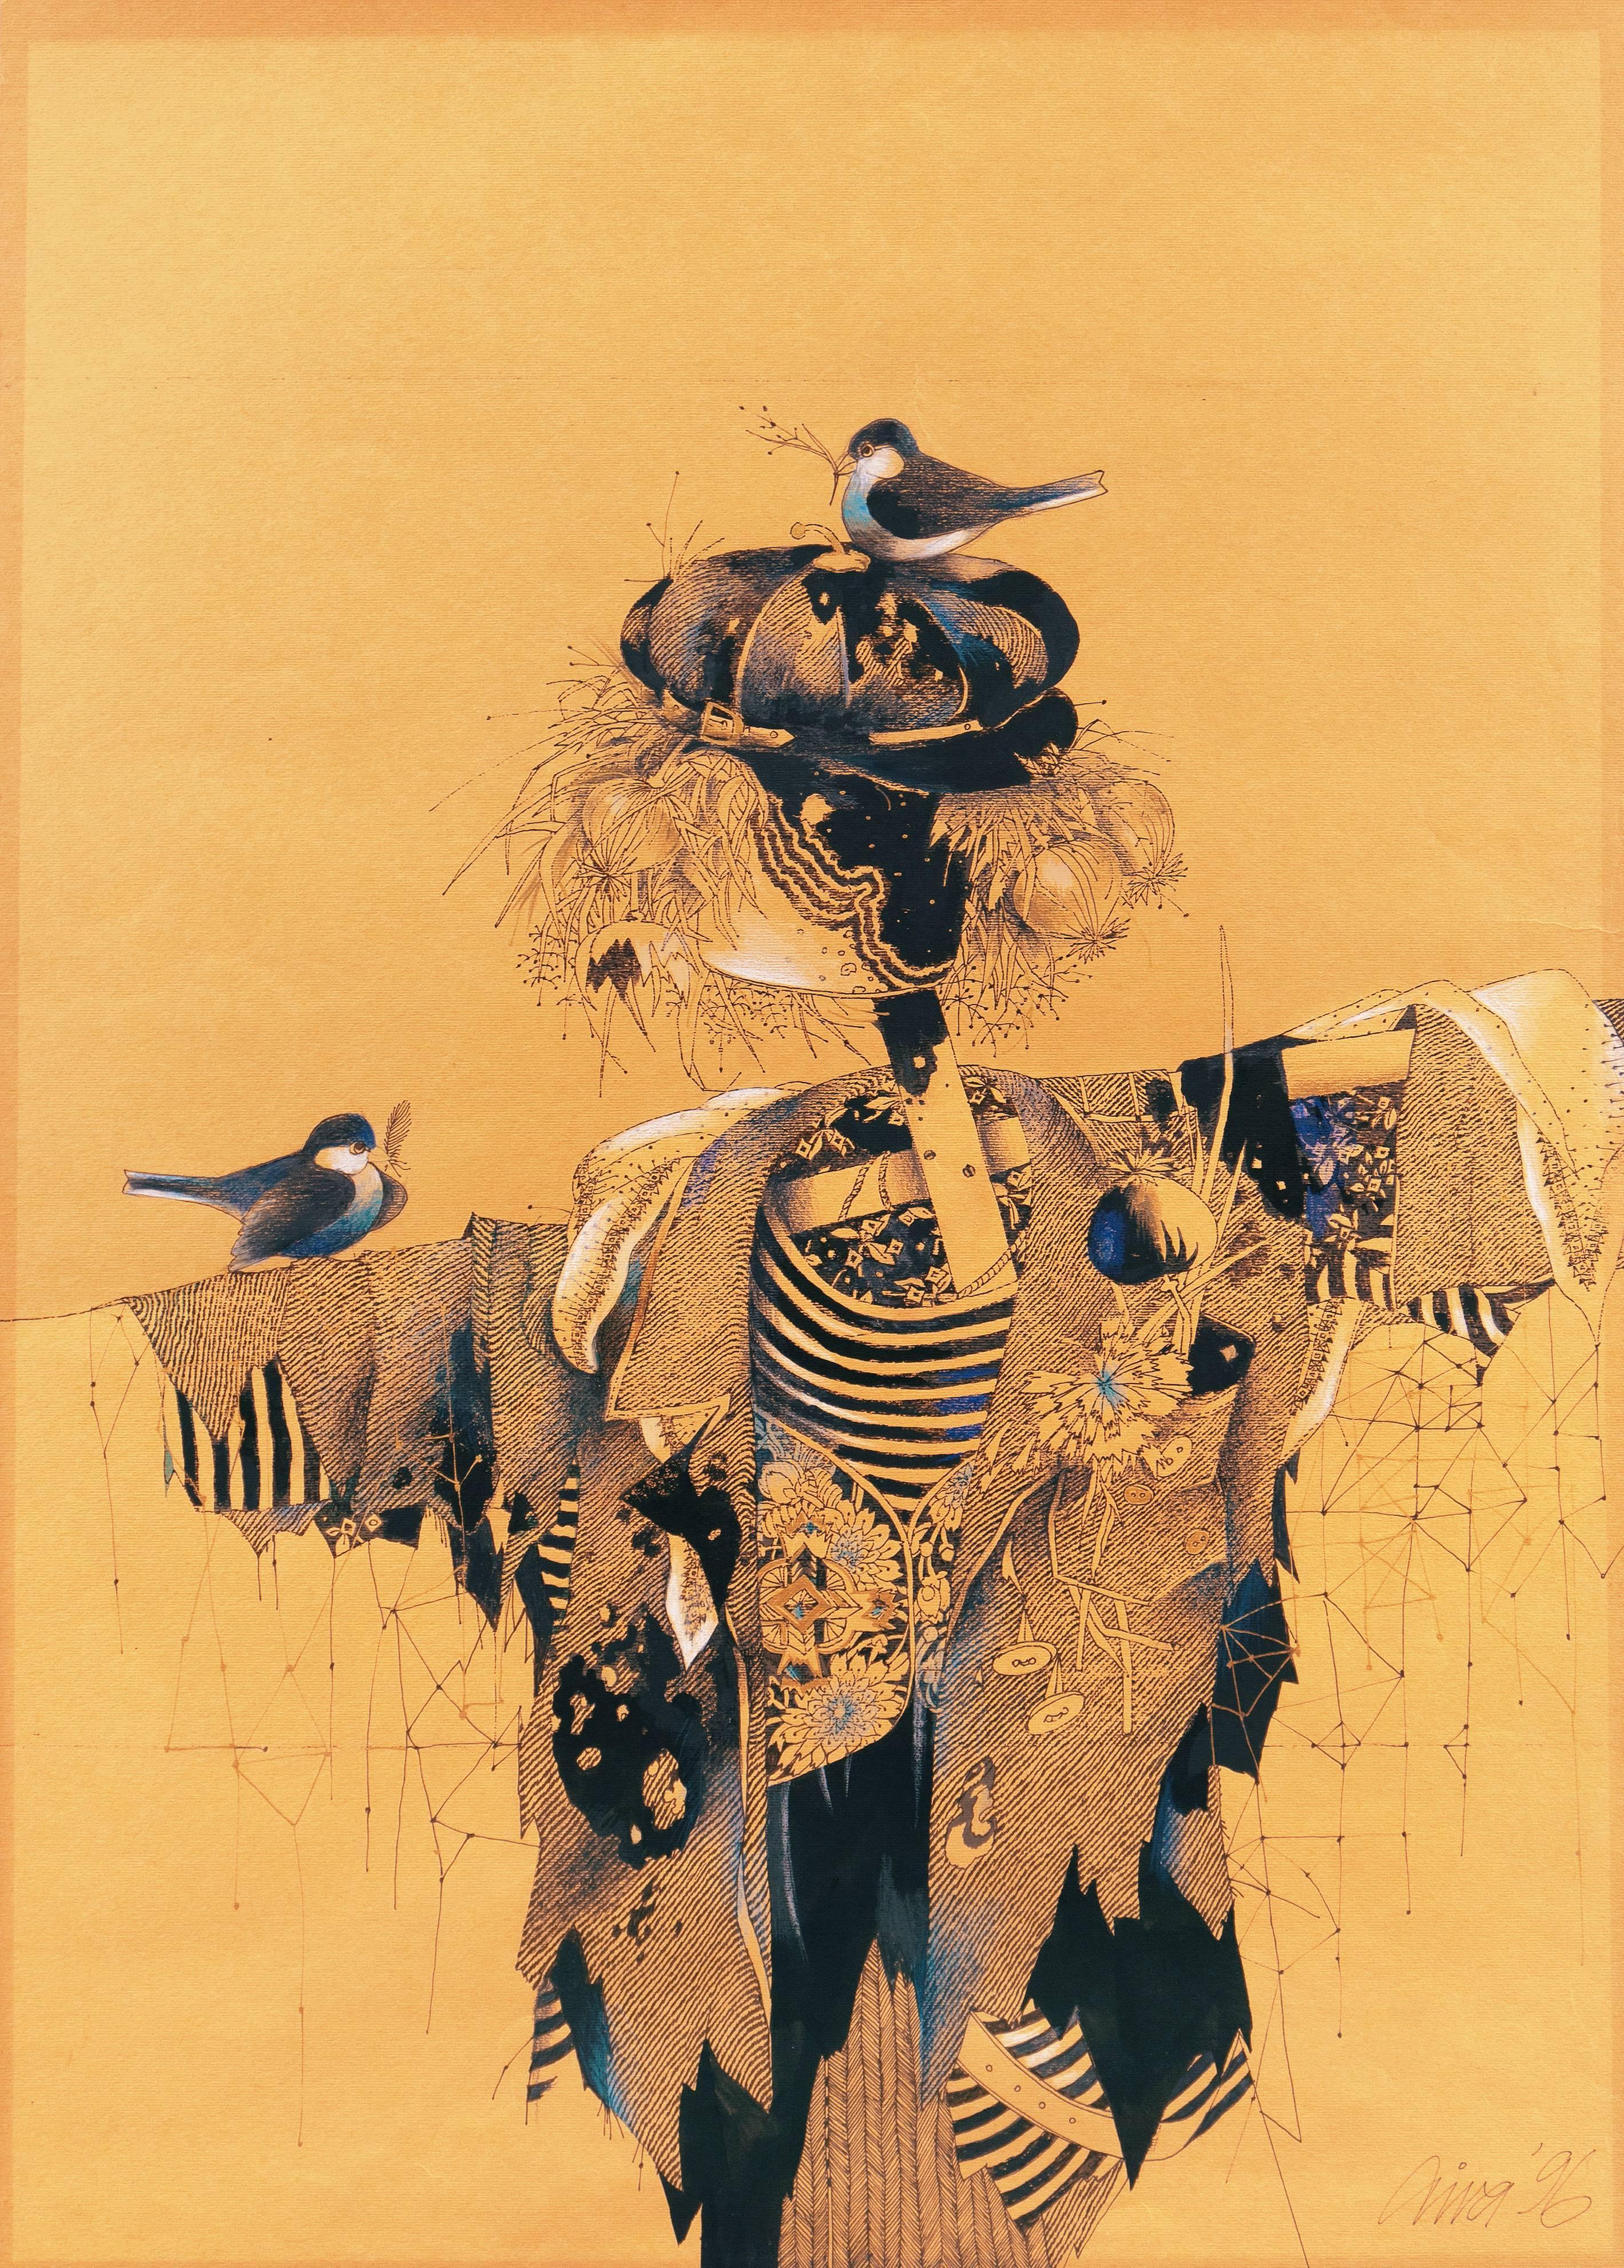 Scarecrow with Nesting Birds